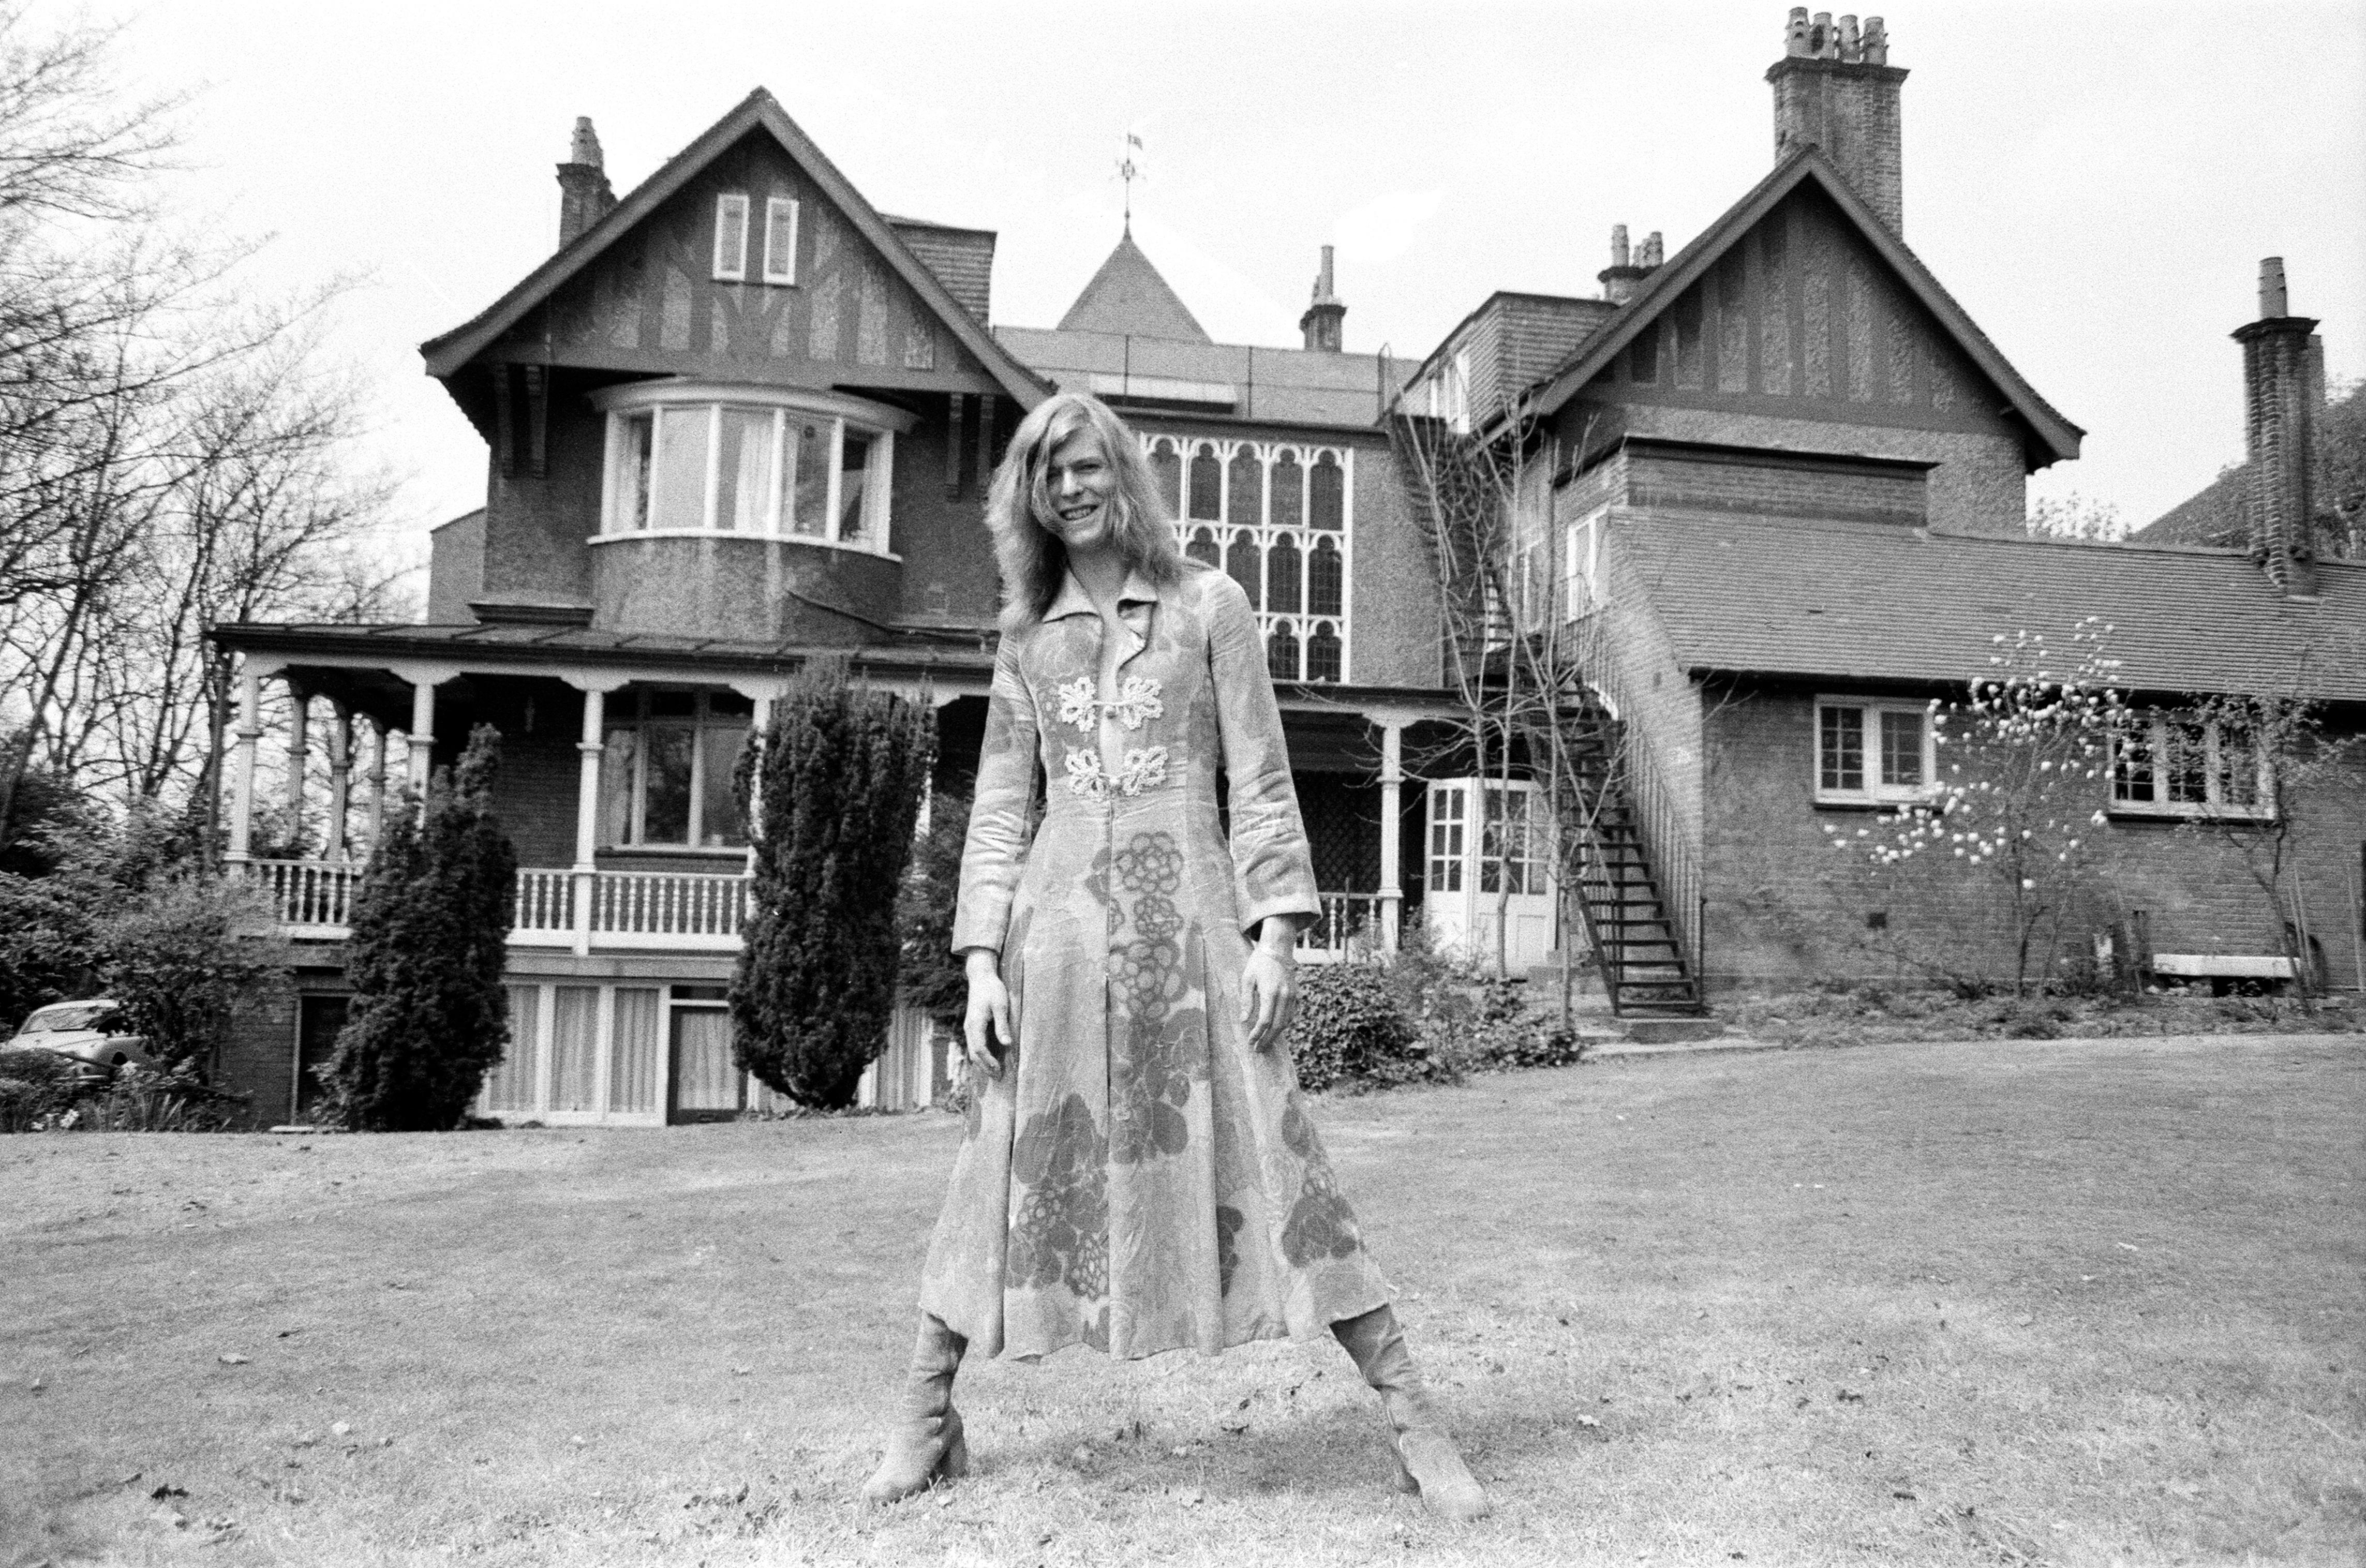 David Bowie at his home, Haddon Hall, at Beckenham, Kent, 20th April 1971. (Photo by Daily Mirror/Mirrorpix/Mirrorpix via Getty Images)